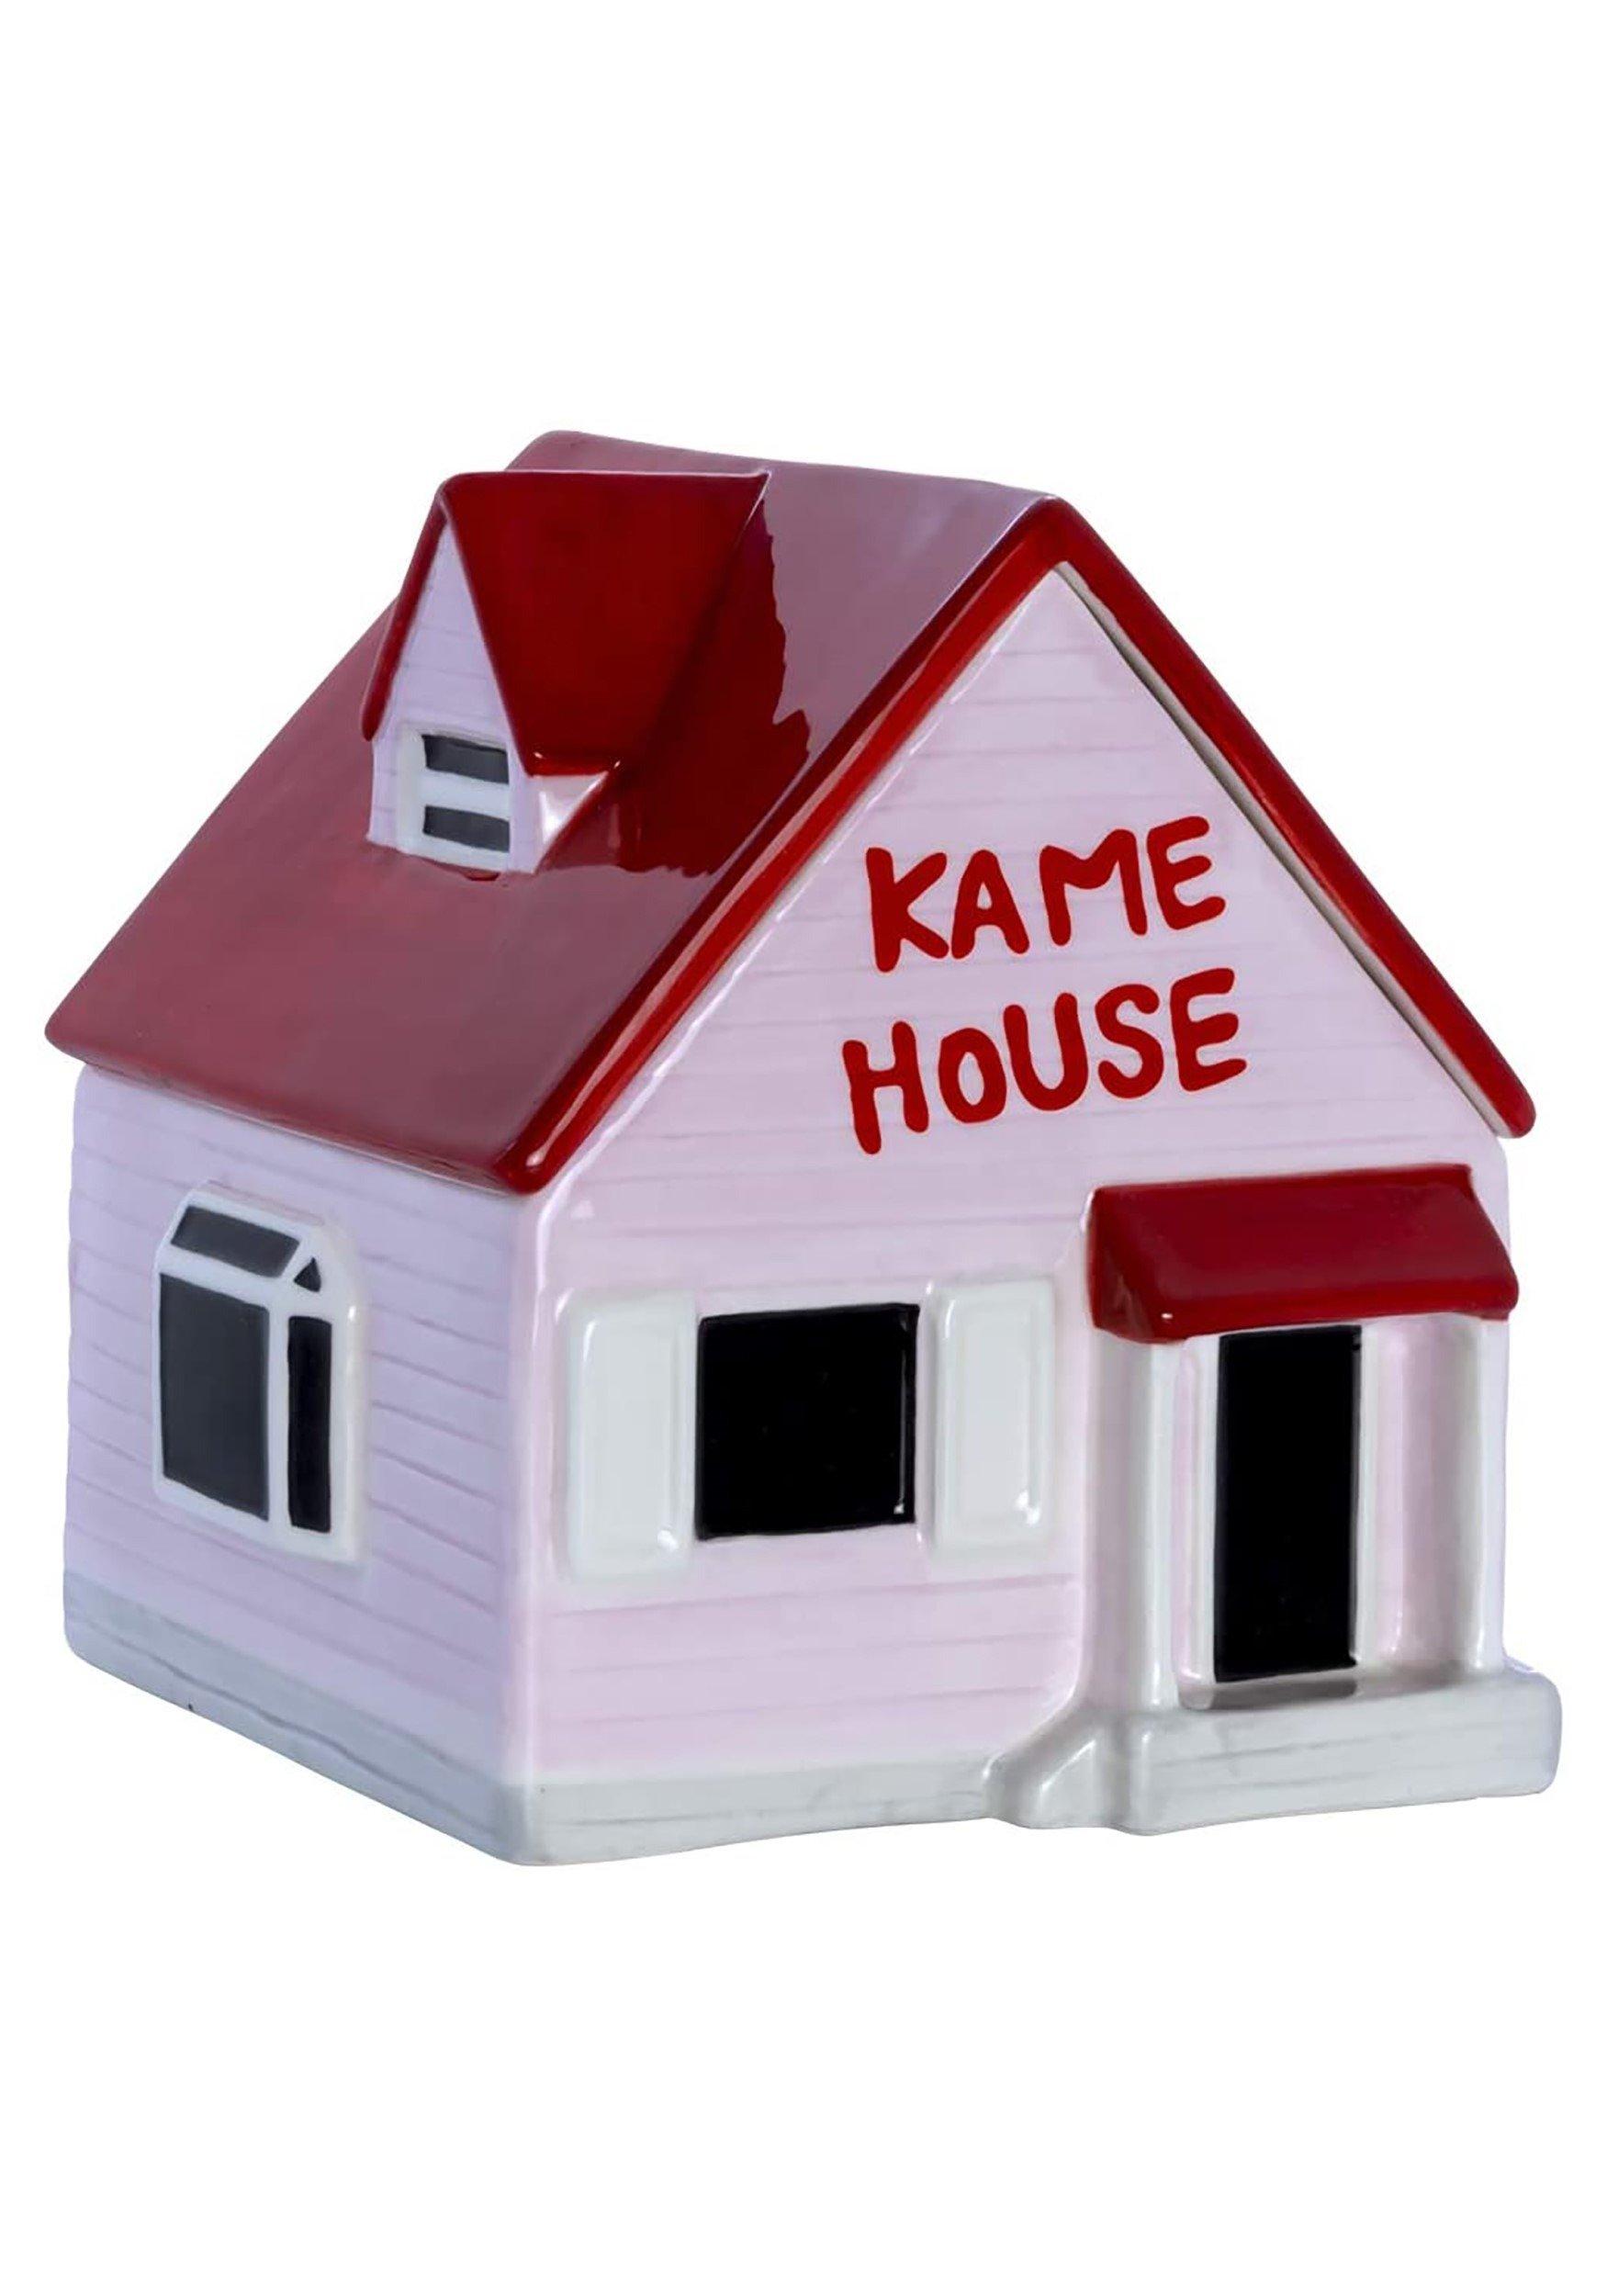 Cookie jar Dragon Ball Z Kame House